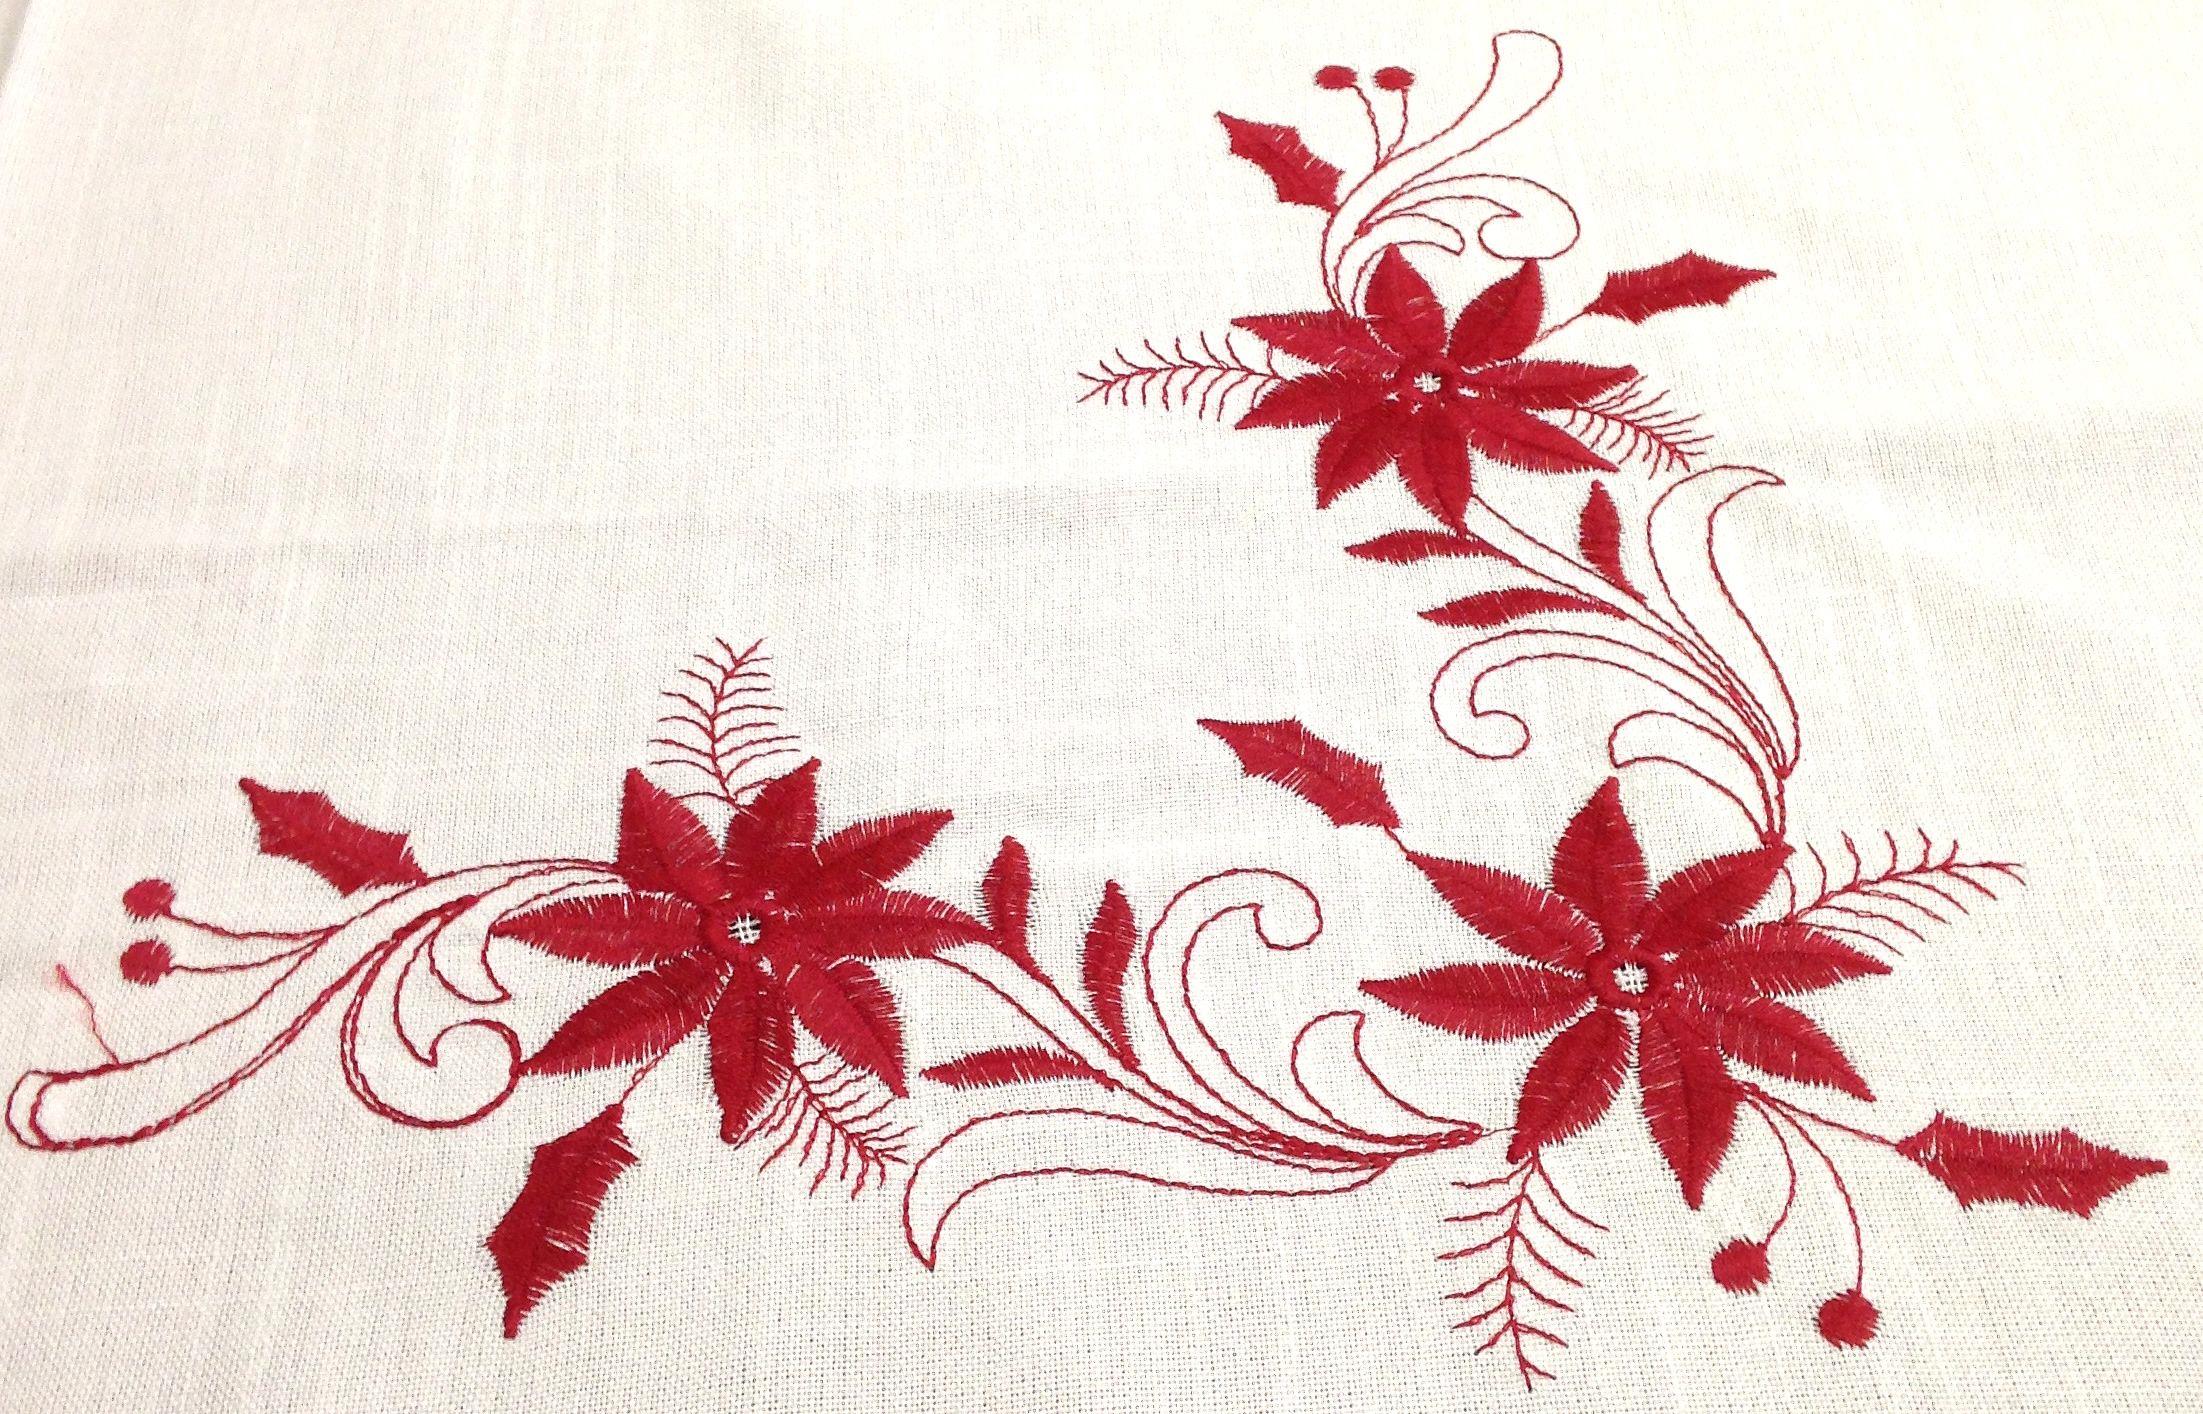 Pin de Coraline Johons en manteles | Pinterest | Embroidery ...